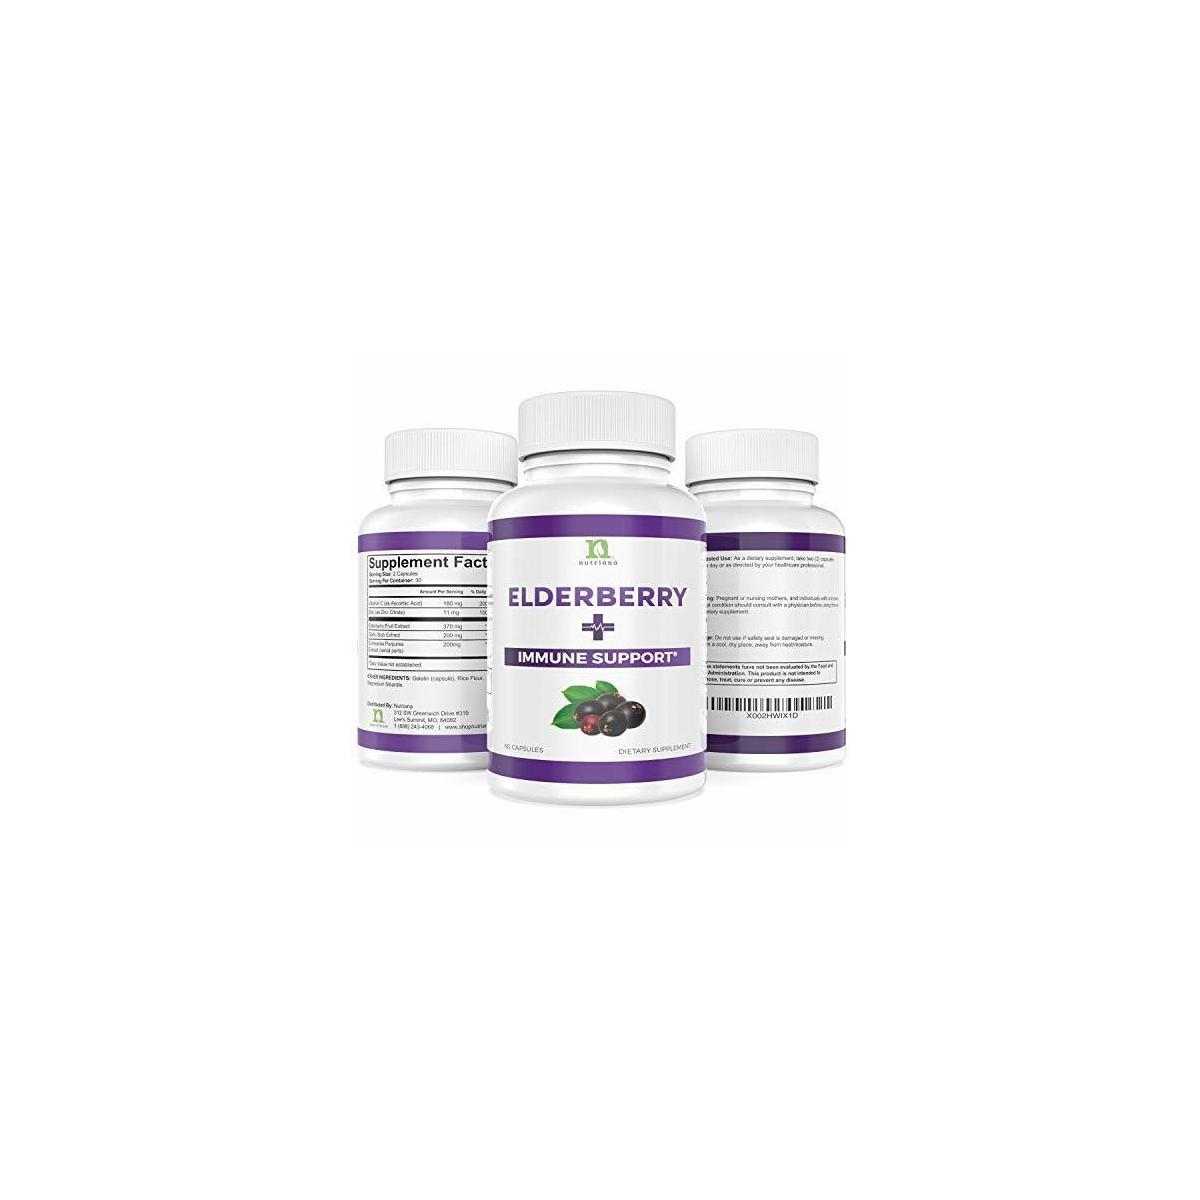 Sambucus Elderberry Capsules Supplement with Zinc, Vitamin C, Garlic & Echinacea - Immune Support Boost For Adults Women and Men Elderberry and Zinc Pills Vitamins Extract - 60 Elderberry Zinc Capsule